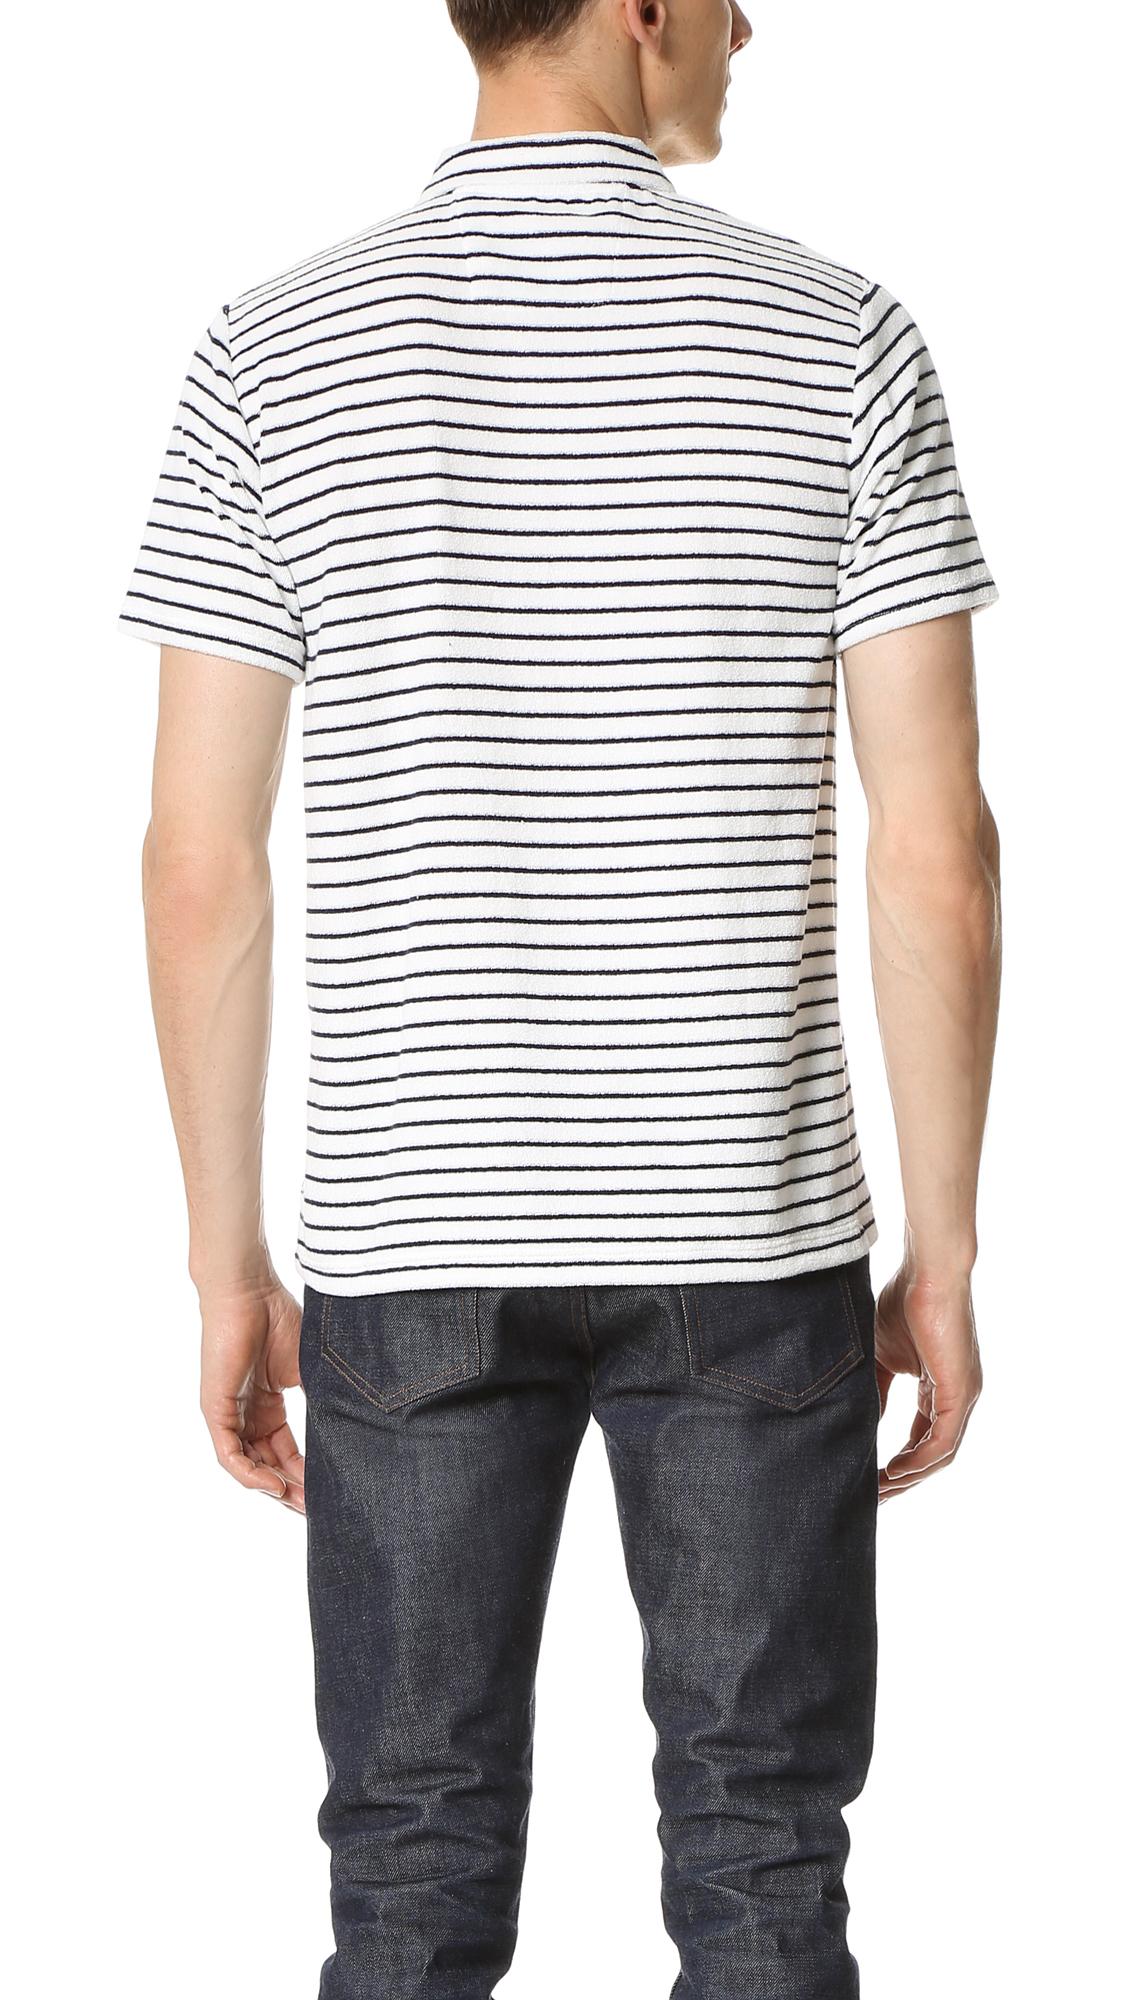 Ben Sherman Cotton Terry Polo in White for Men